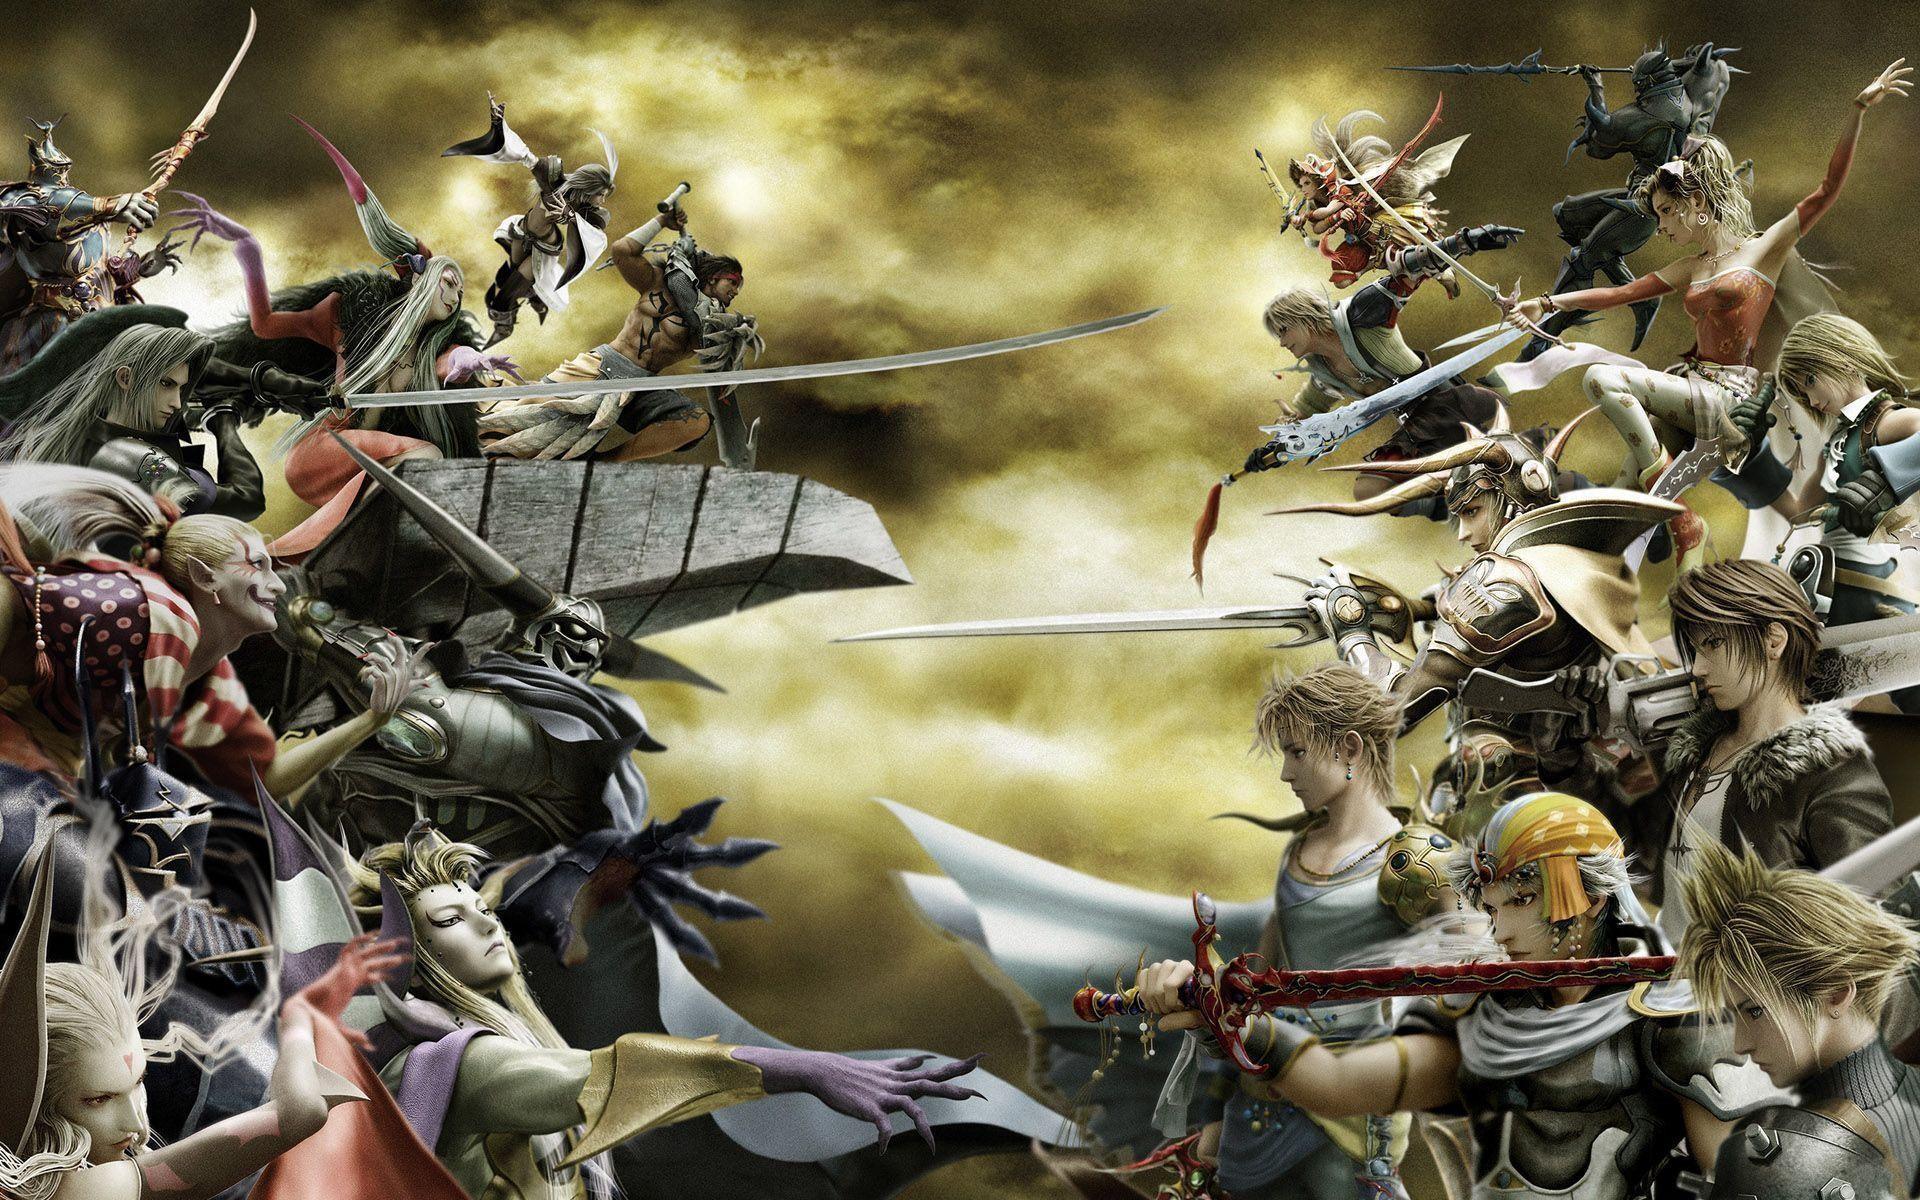 Final Fantasy wallpapers 14330 – Games – Television / Games